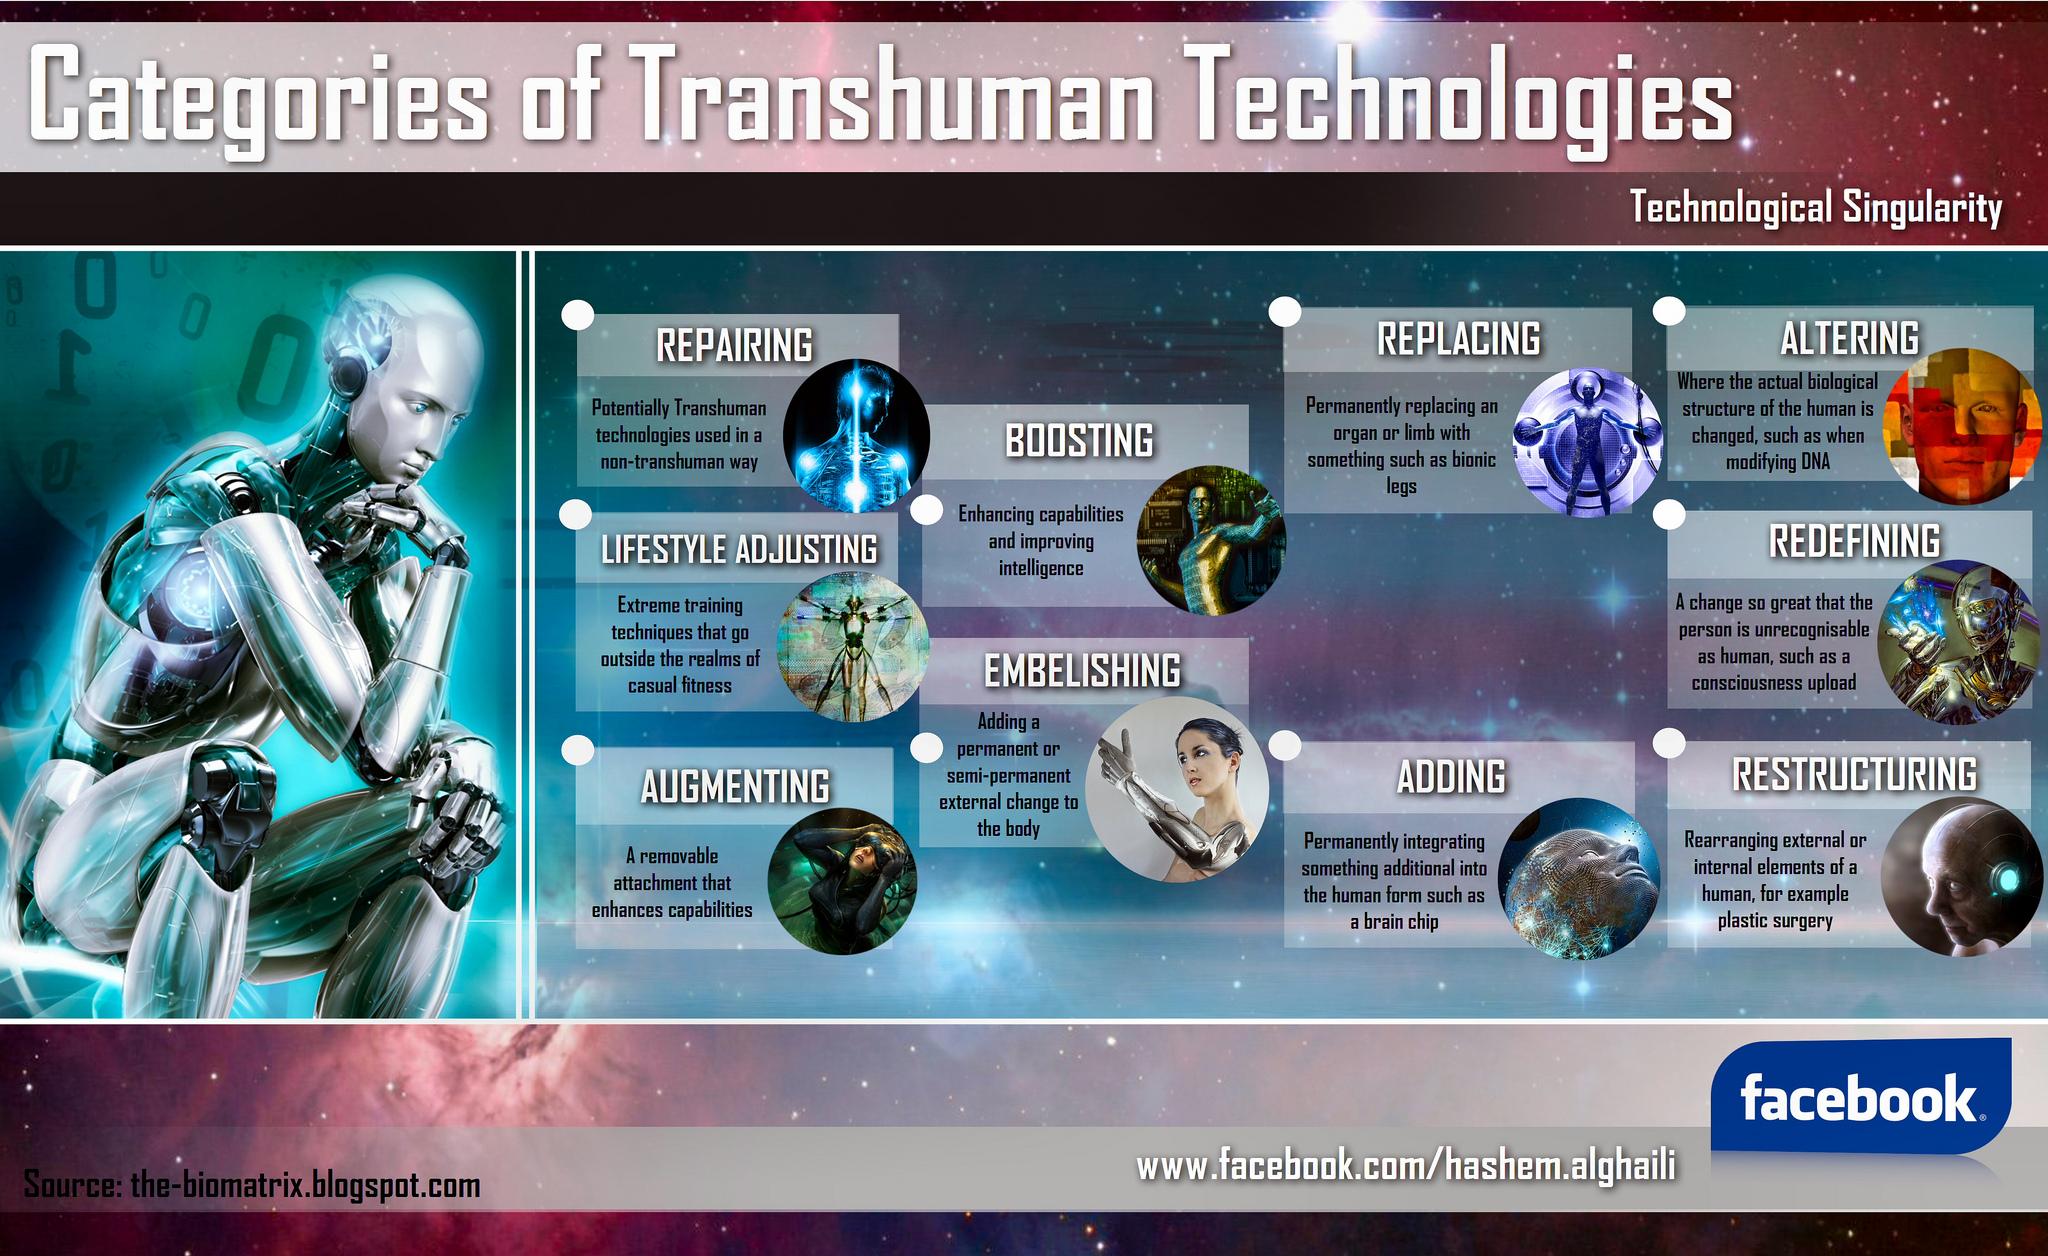 Category Technologies: Categories Of Transhuman Technologies